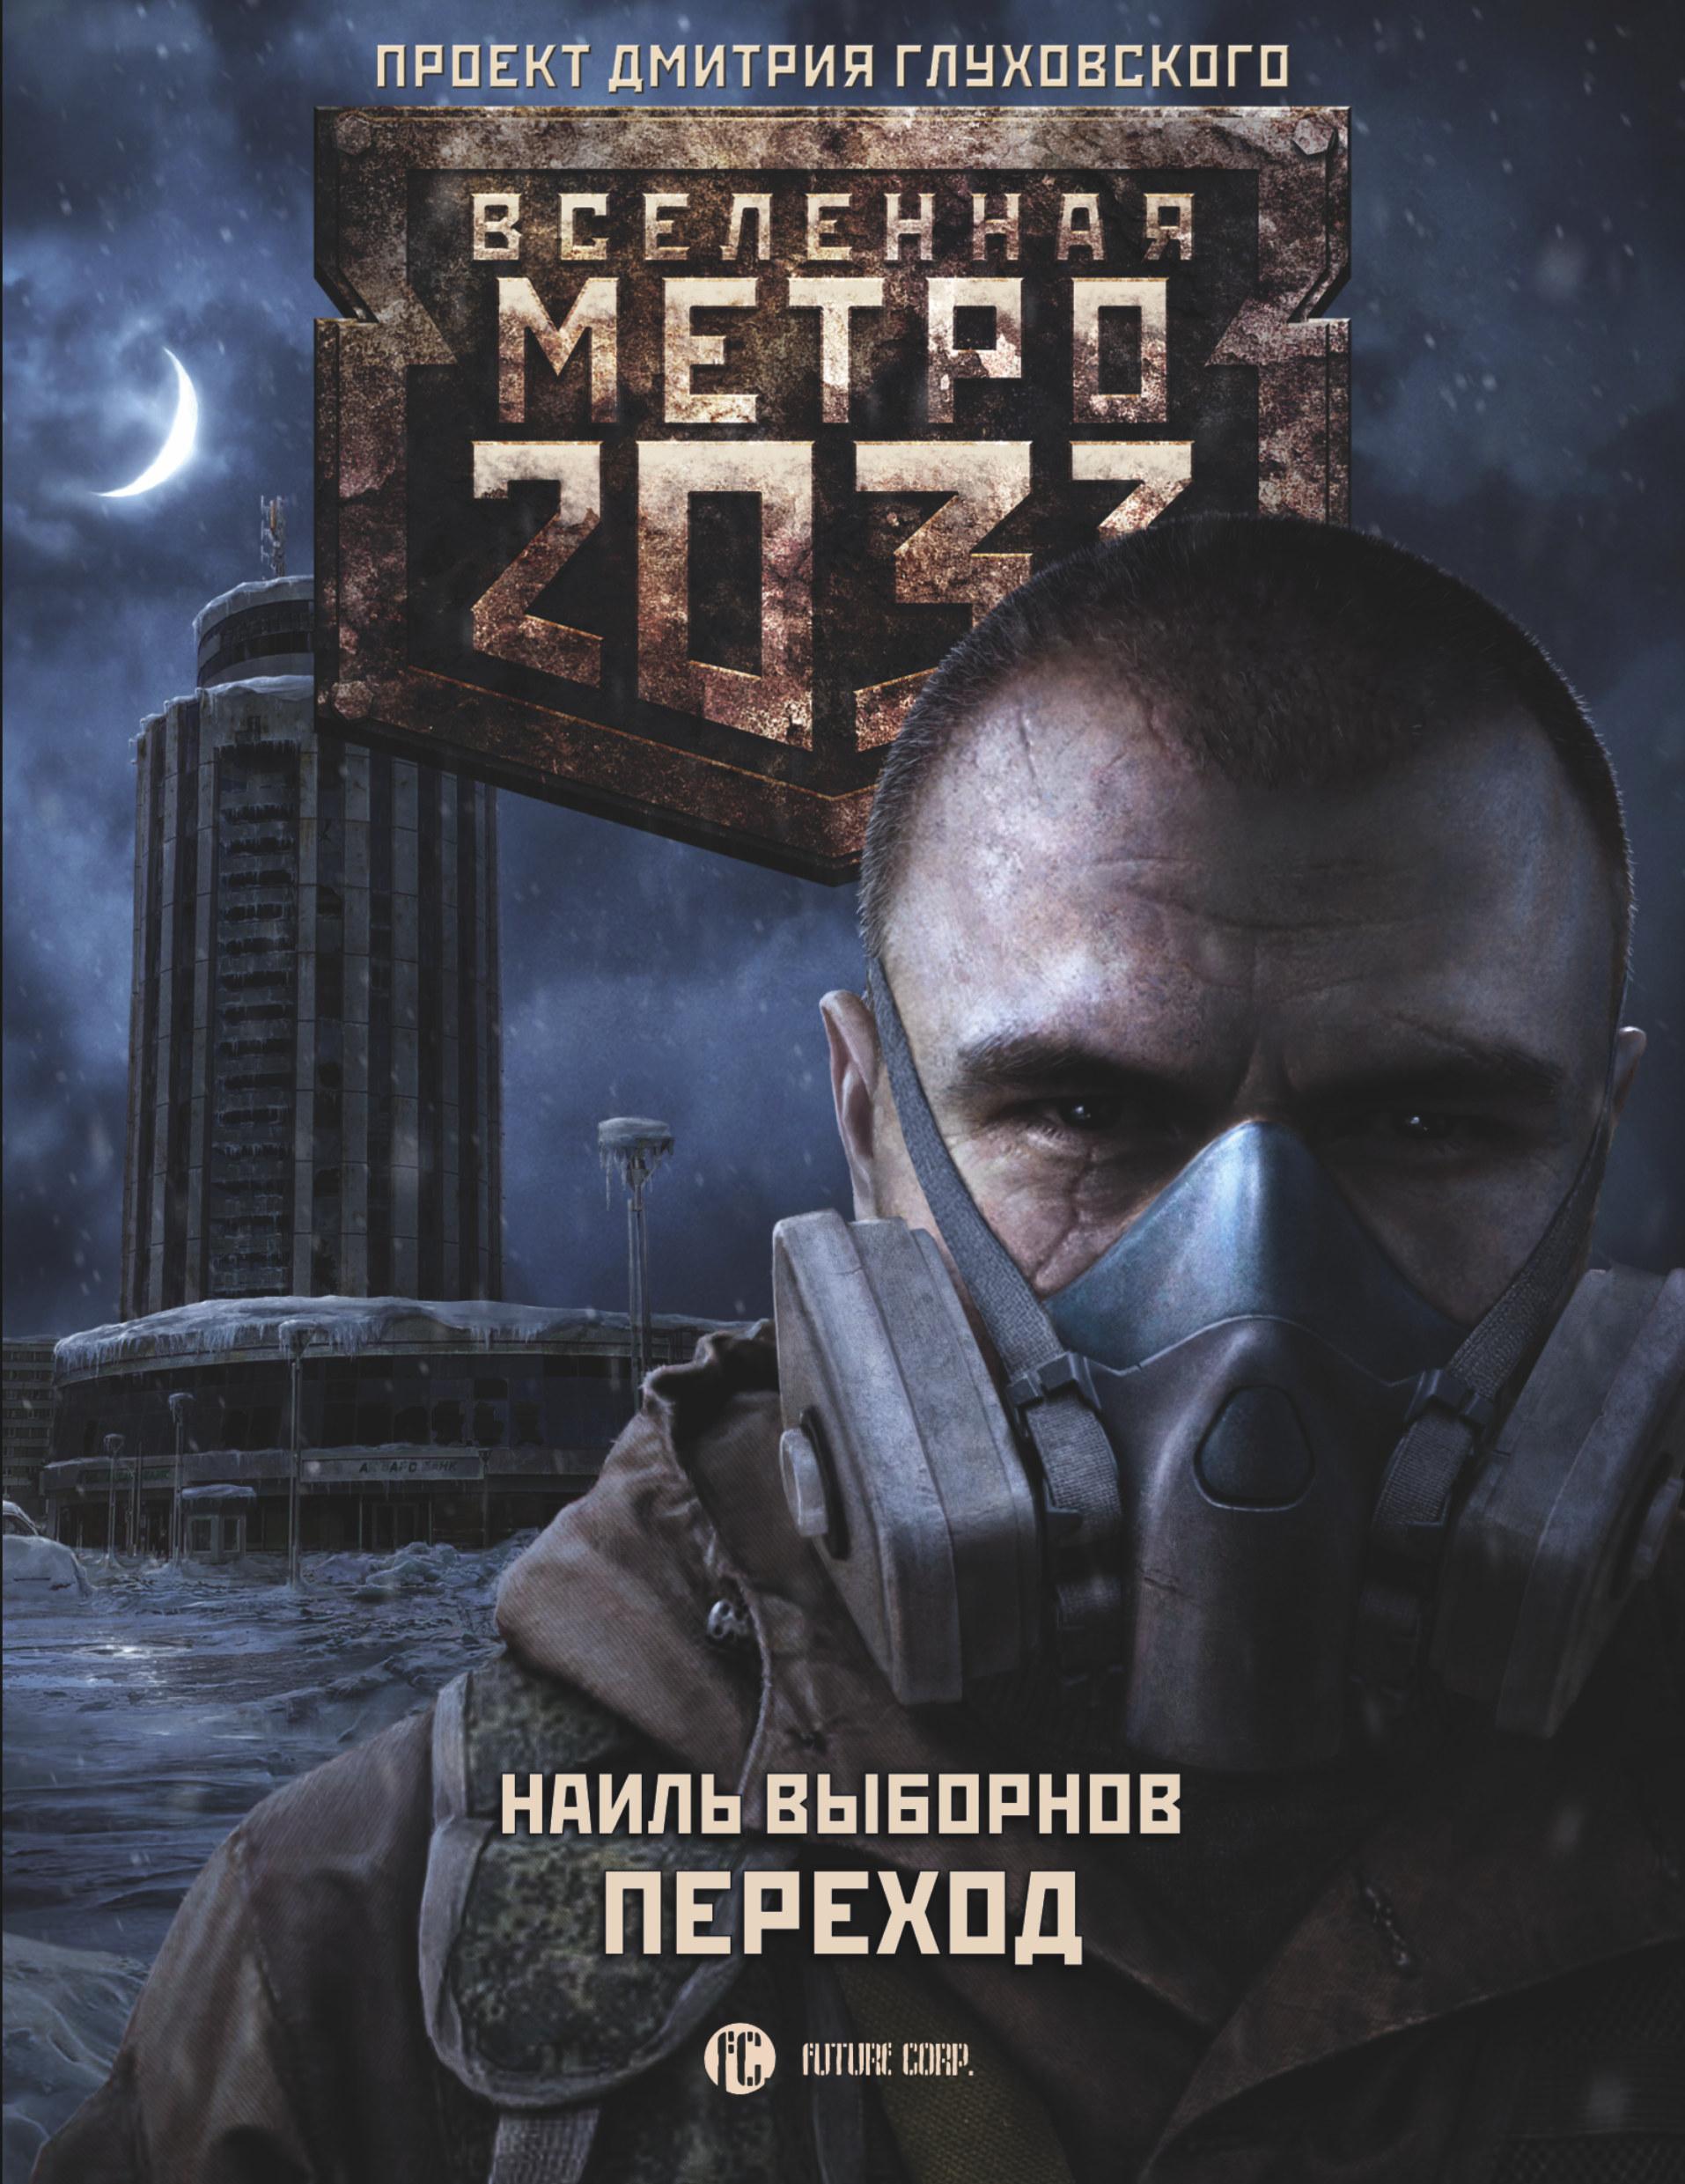 Выборнов Н.Э. Метро 2033: Переход куплю камаз 55102 б у в набережных челнах